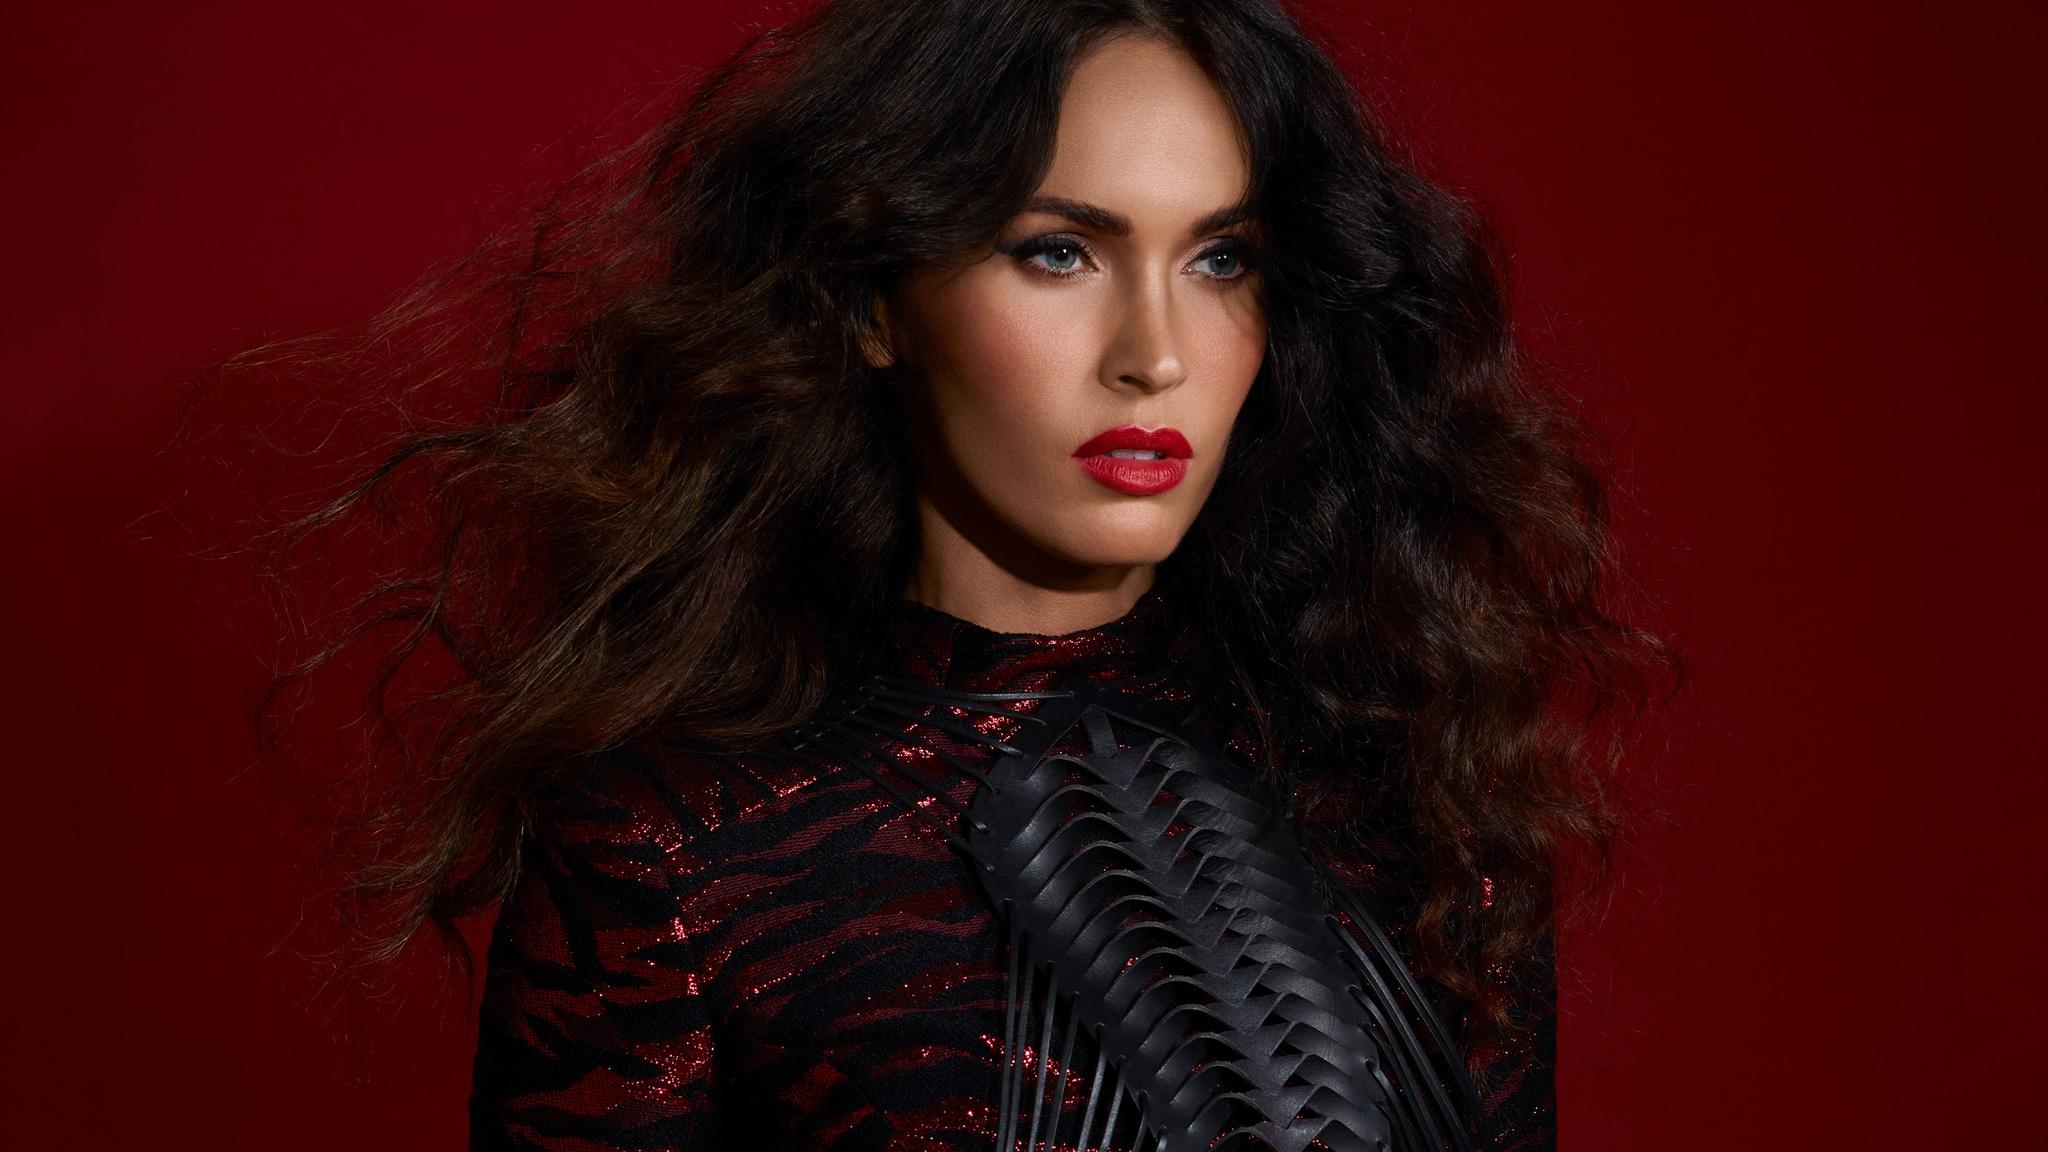 Megan Fox Prestige Magazine 2017 Photoshoot 4s